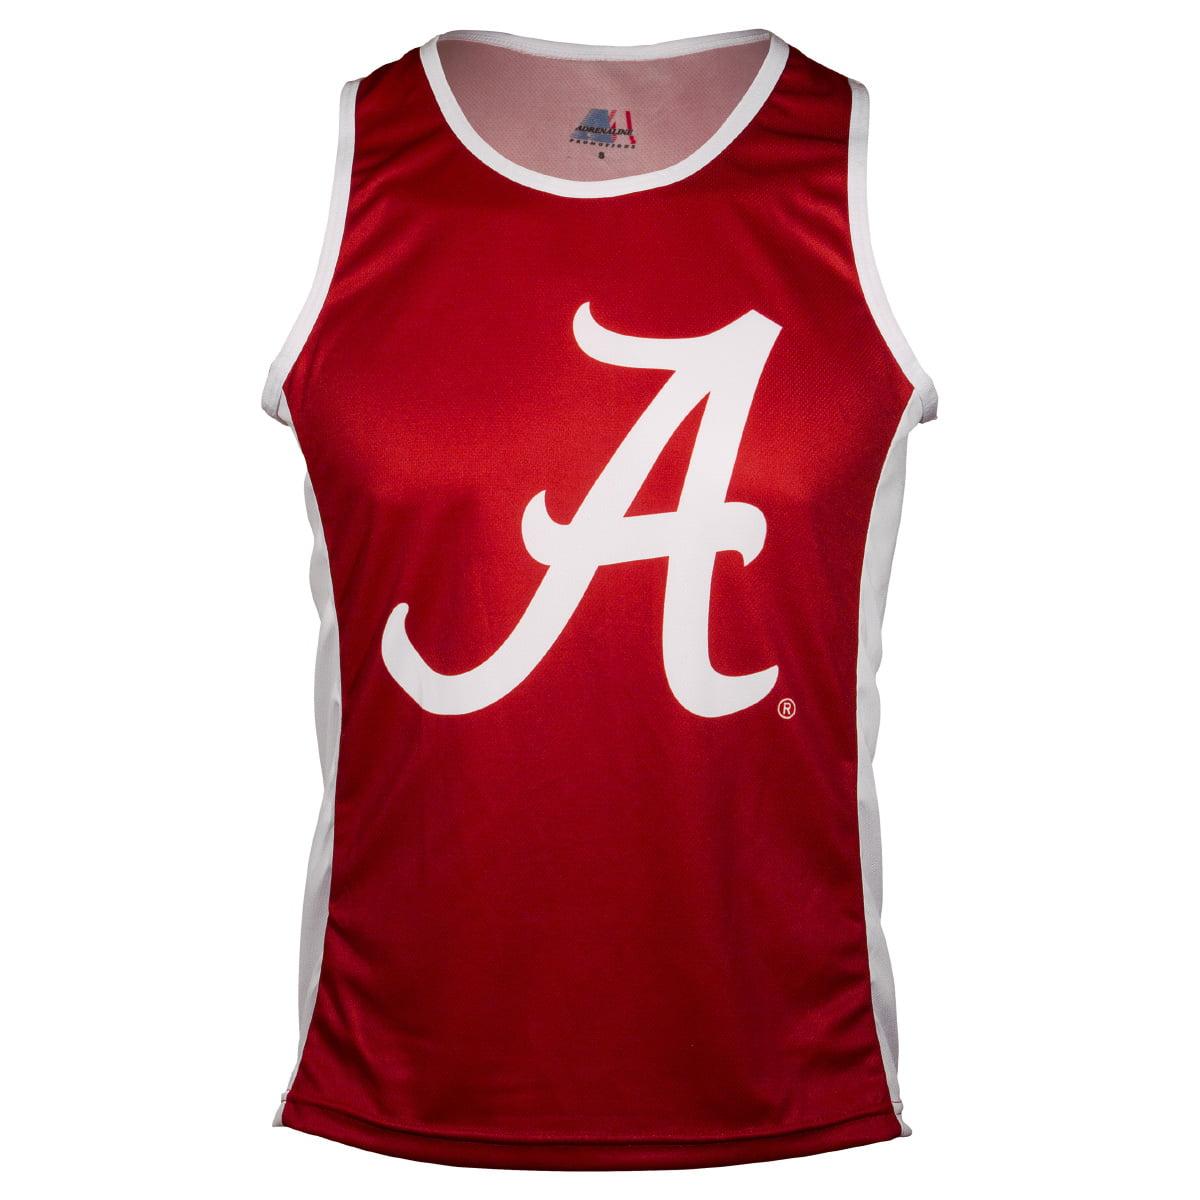 Adrenaline Promotions University of Alabama Crimson Tide Run/Tri Singlet